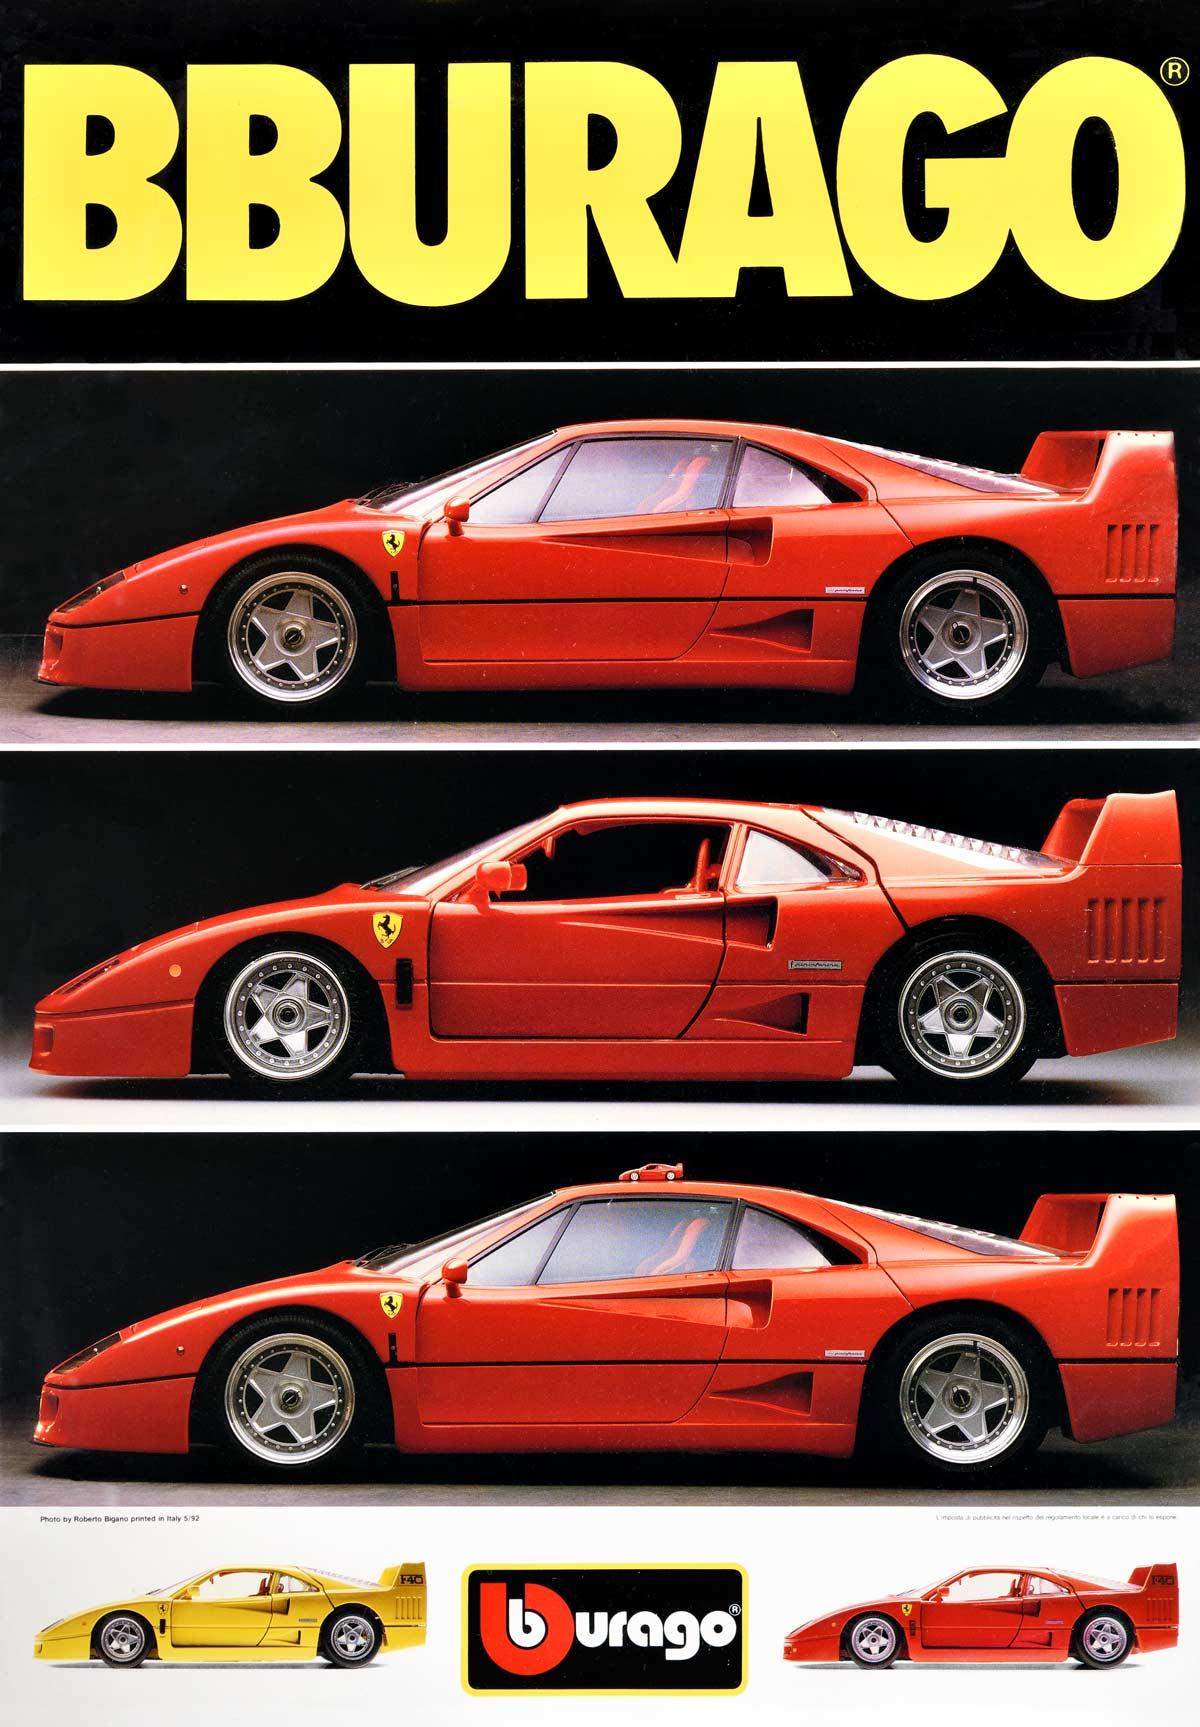 001005 Bburago Poster Ferrari F40 May 1992